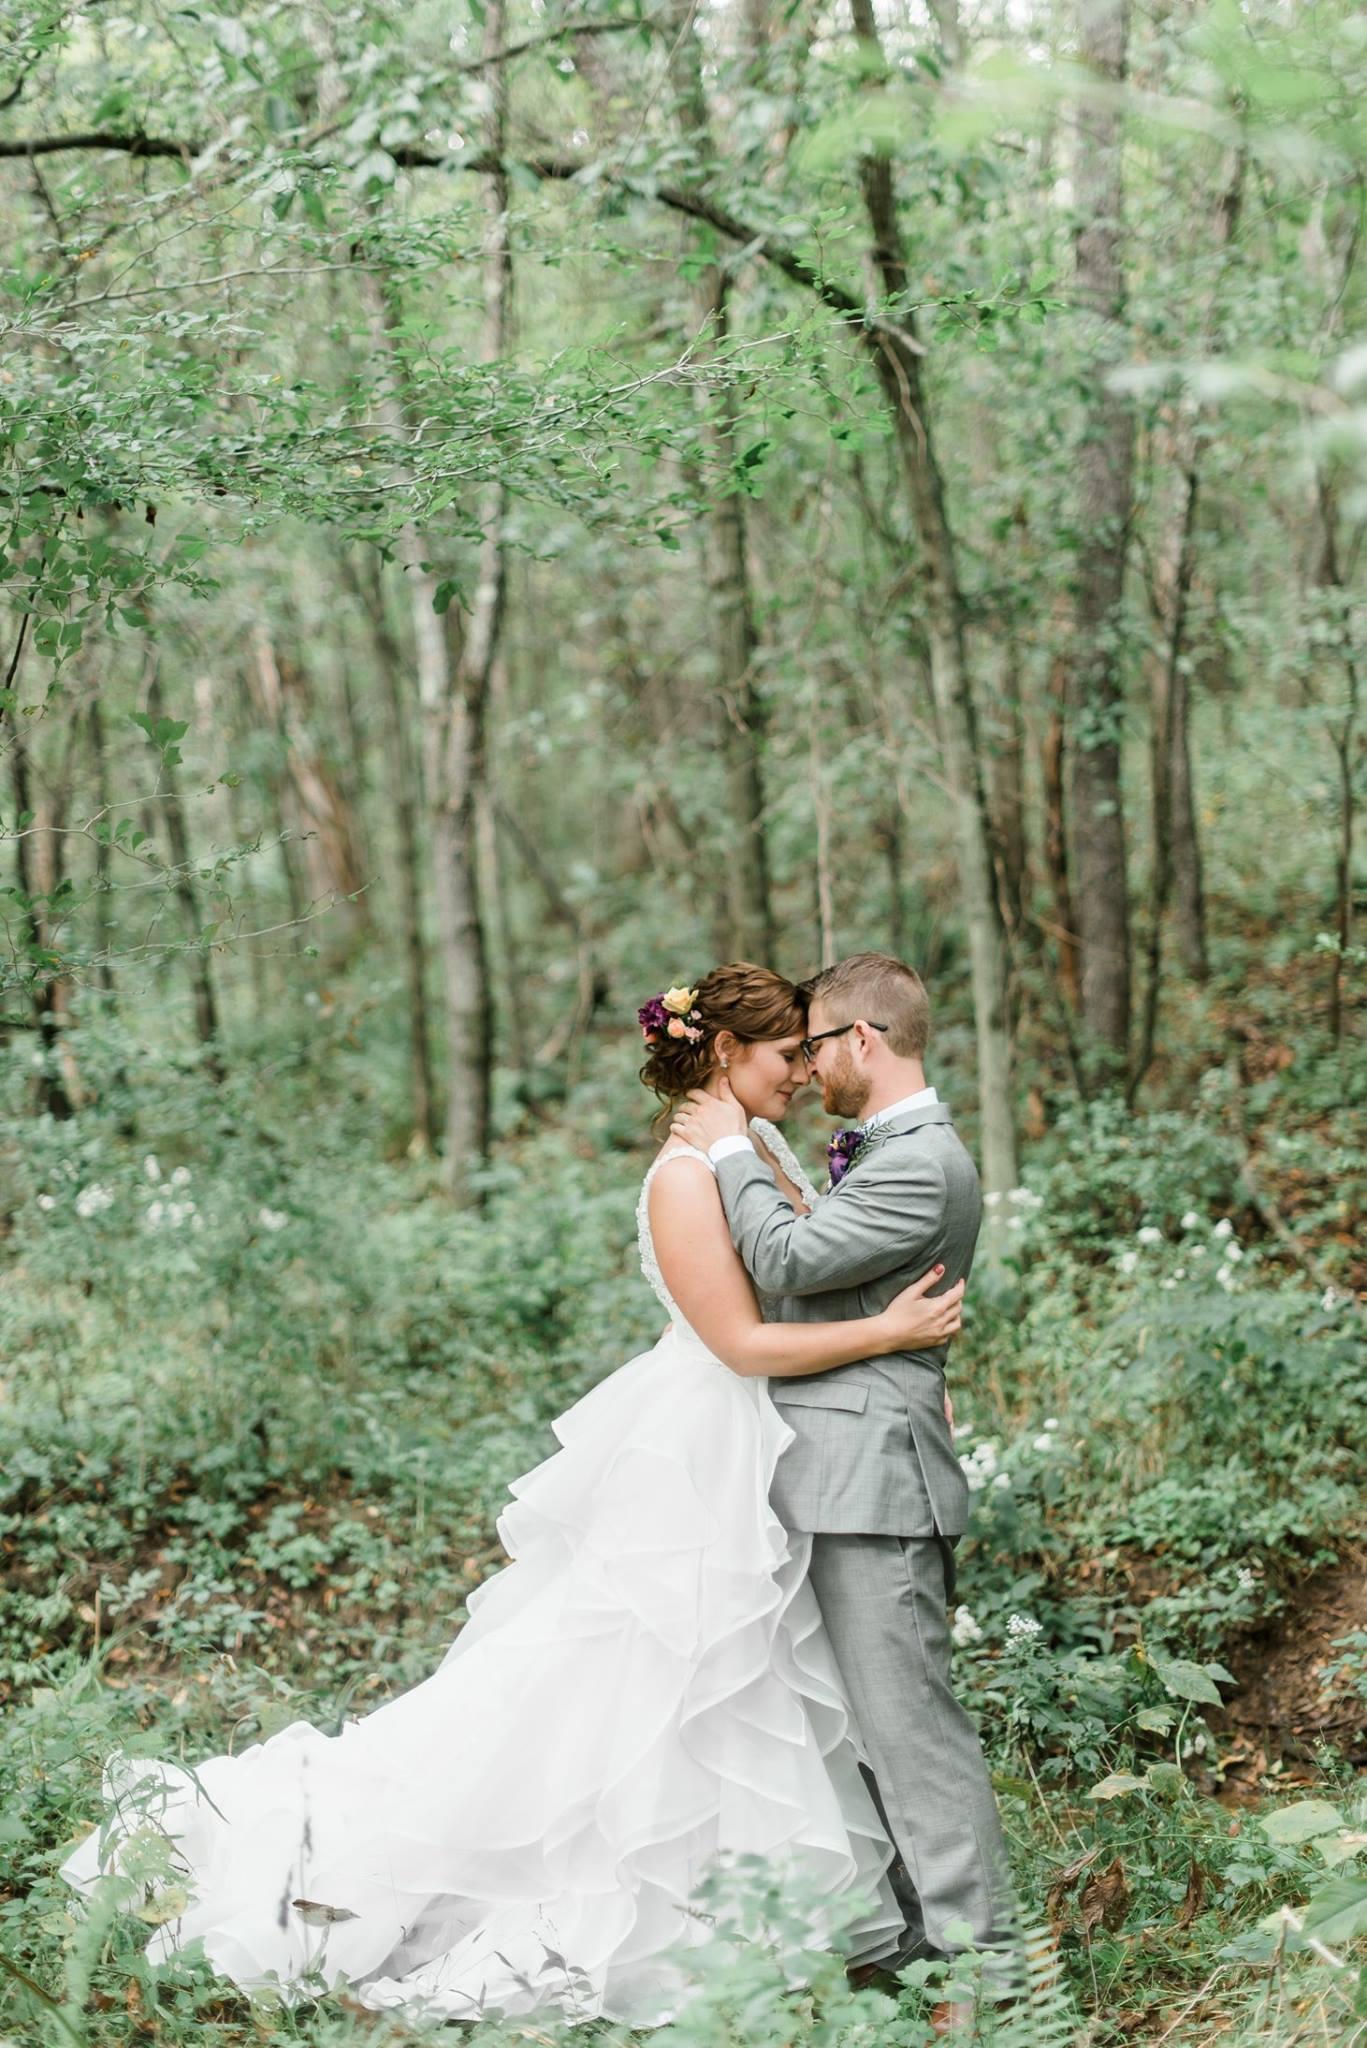 pennsylvania-backyard-wedding-love-diy-bohemian-romantic-colorful-0020.jpg